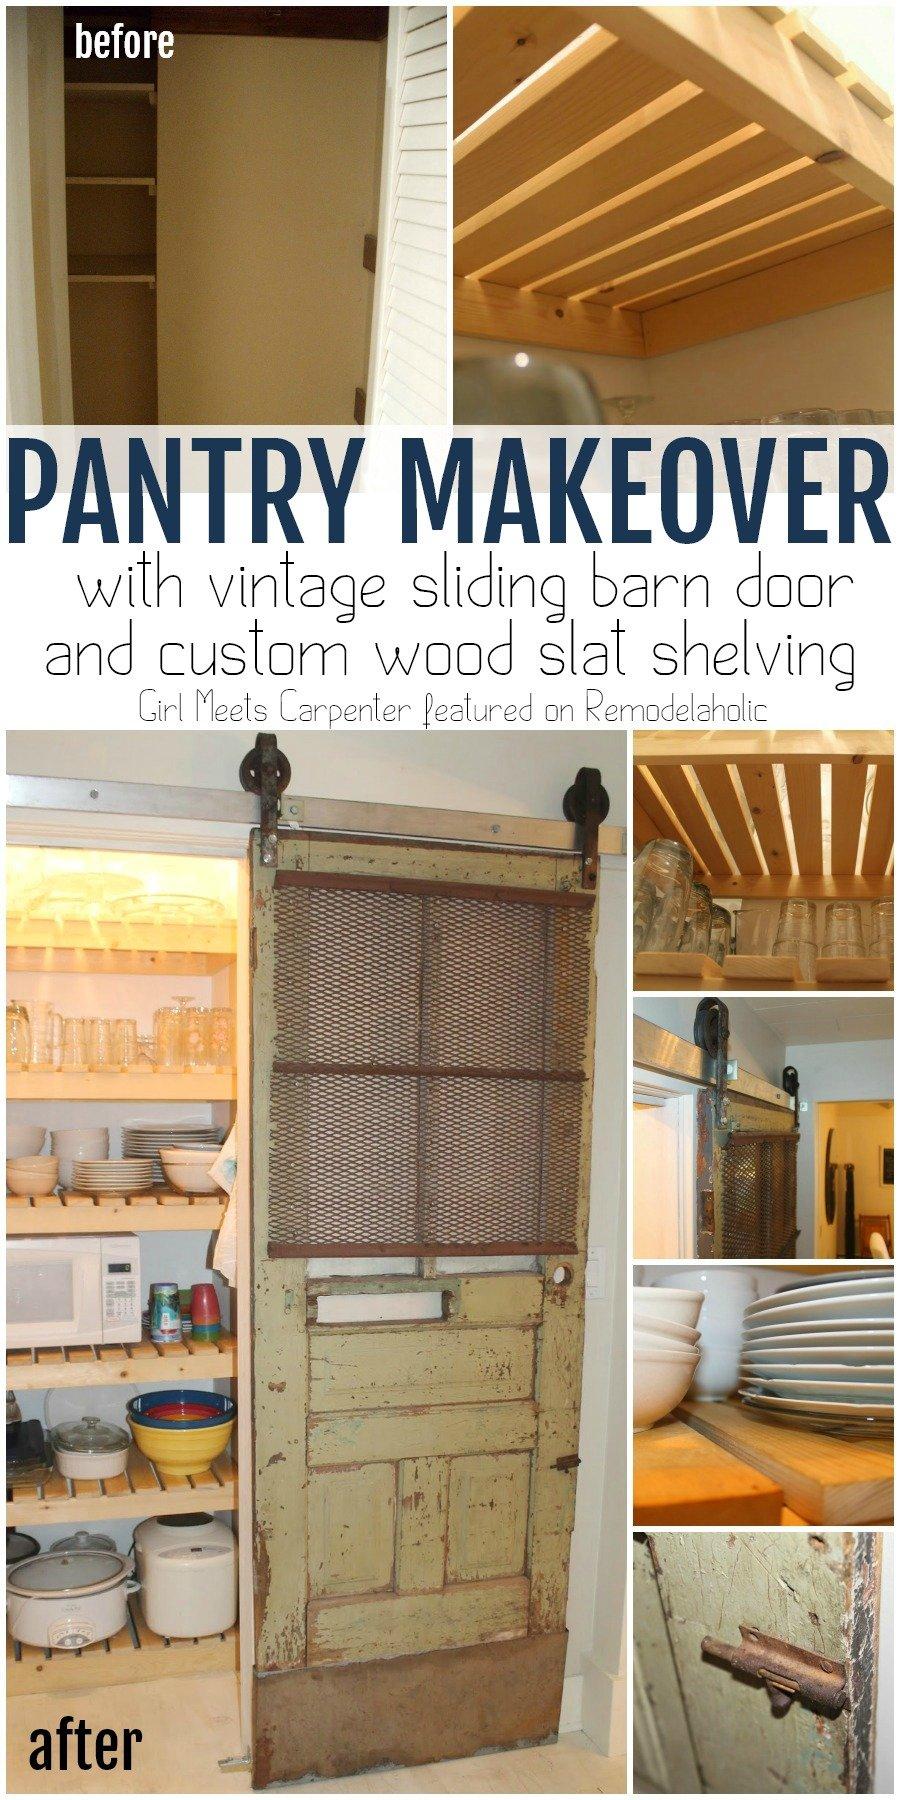 Sliding Barn Door Pantry Makeover With Wood Slat Shelves